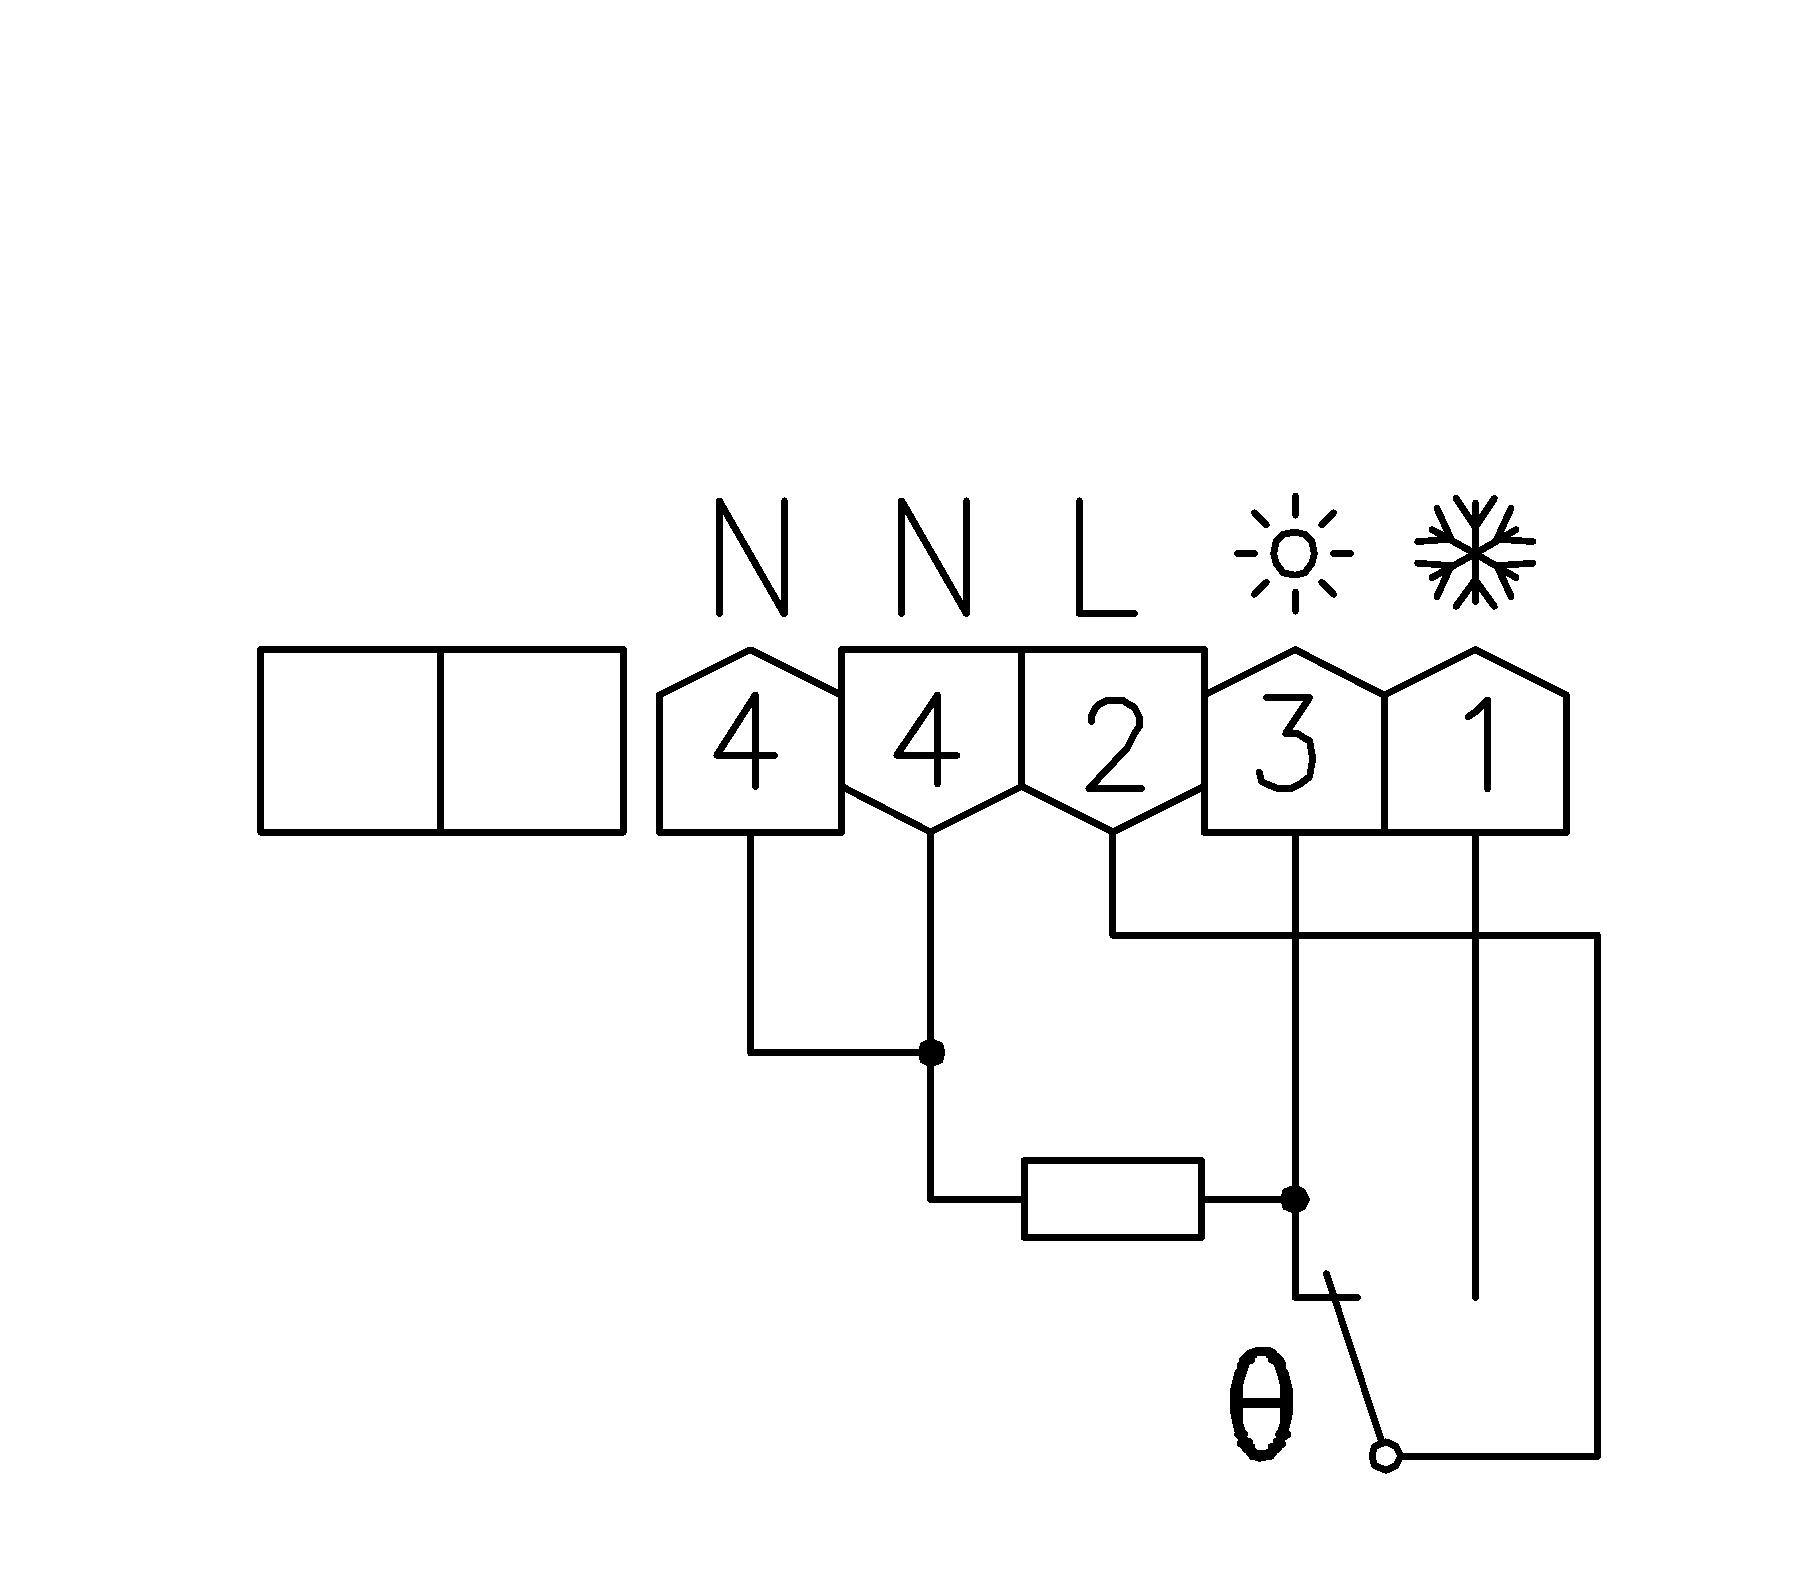 MA010200 Circuit diagram